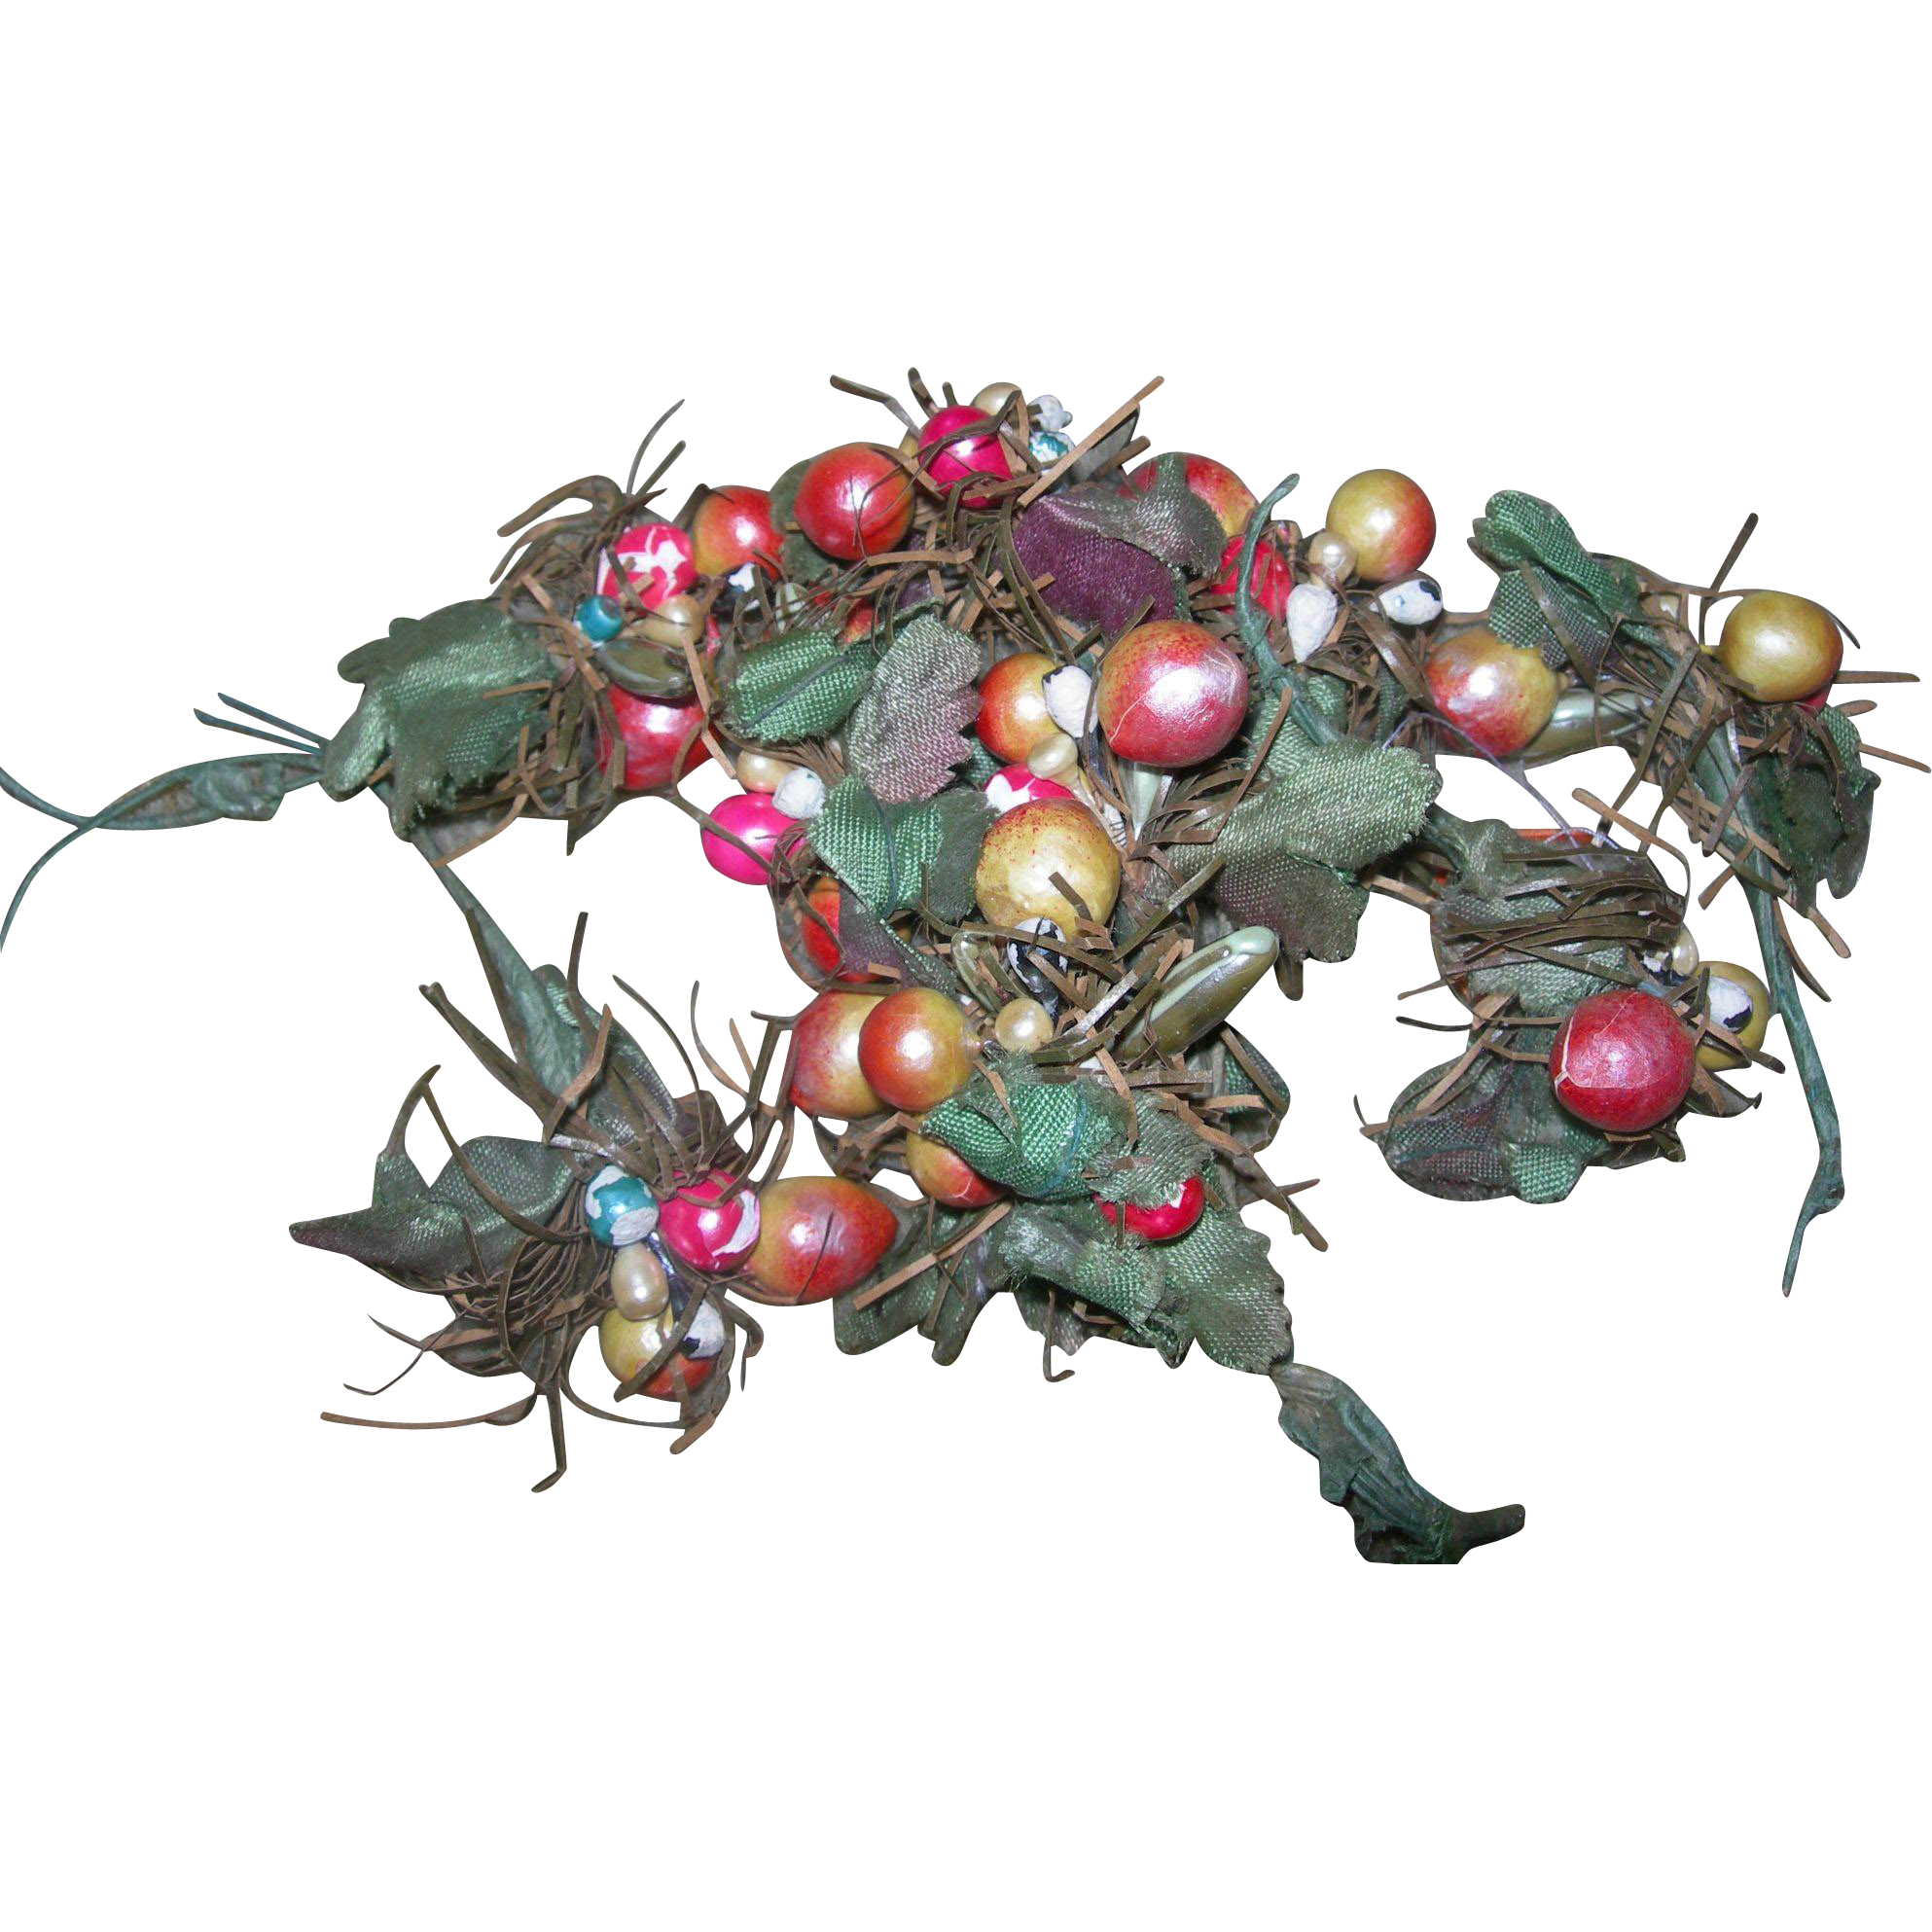 Vintage Christmas Floral Ball Sprays